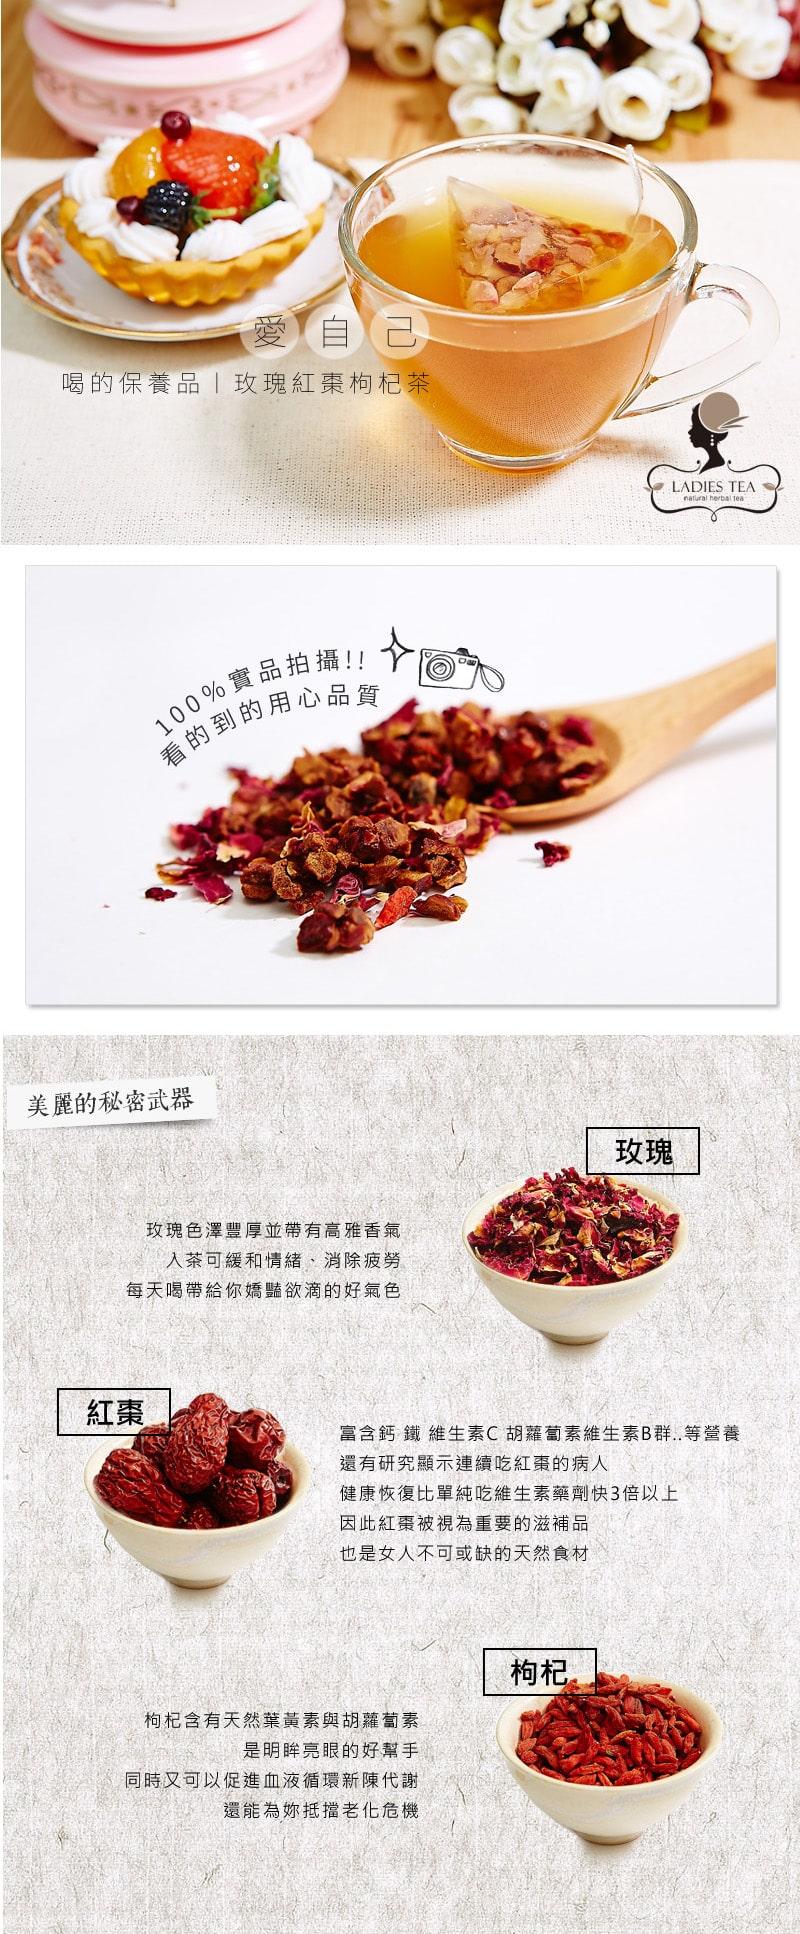 Jujube Rose Tea Packet - details